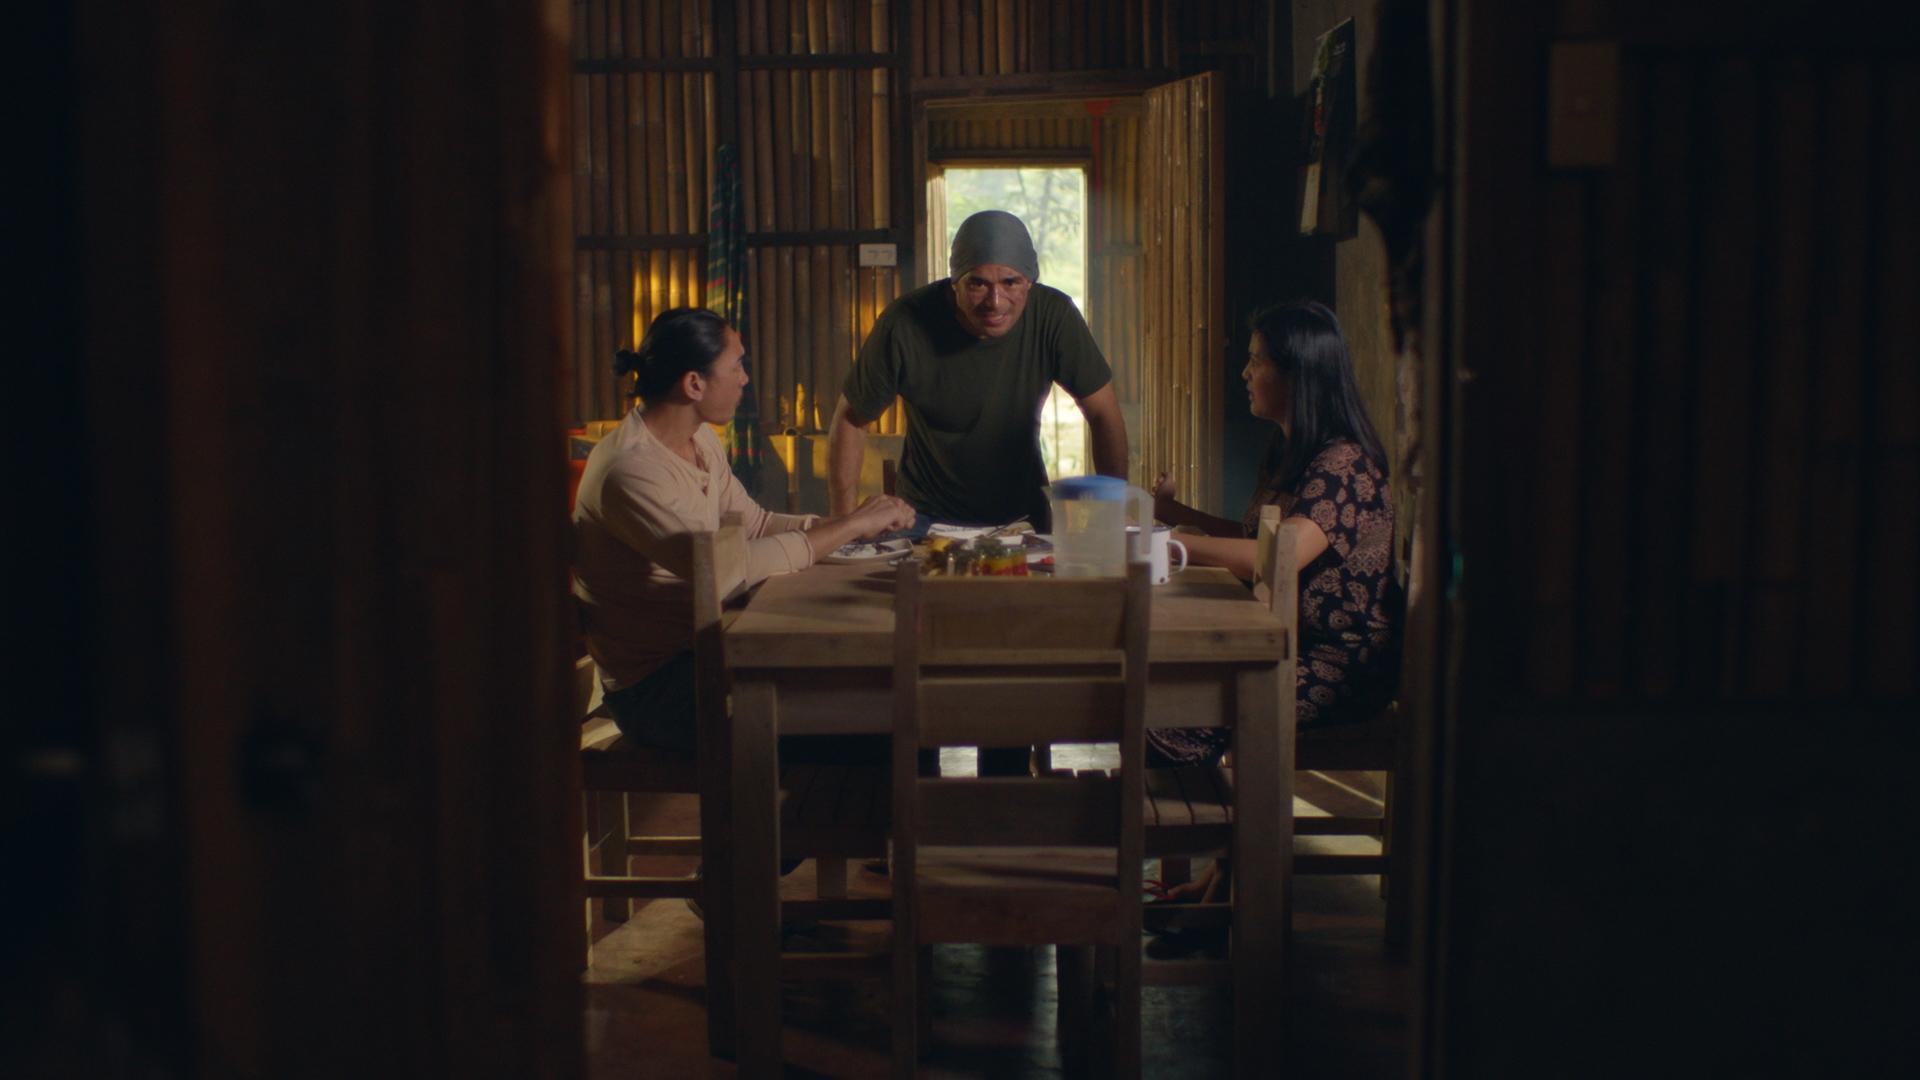 Neil Ryan Sese, Rich Asuncion, and Ian Ignacio in Descendants of the Sun (2020)